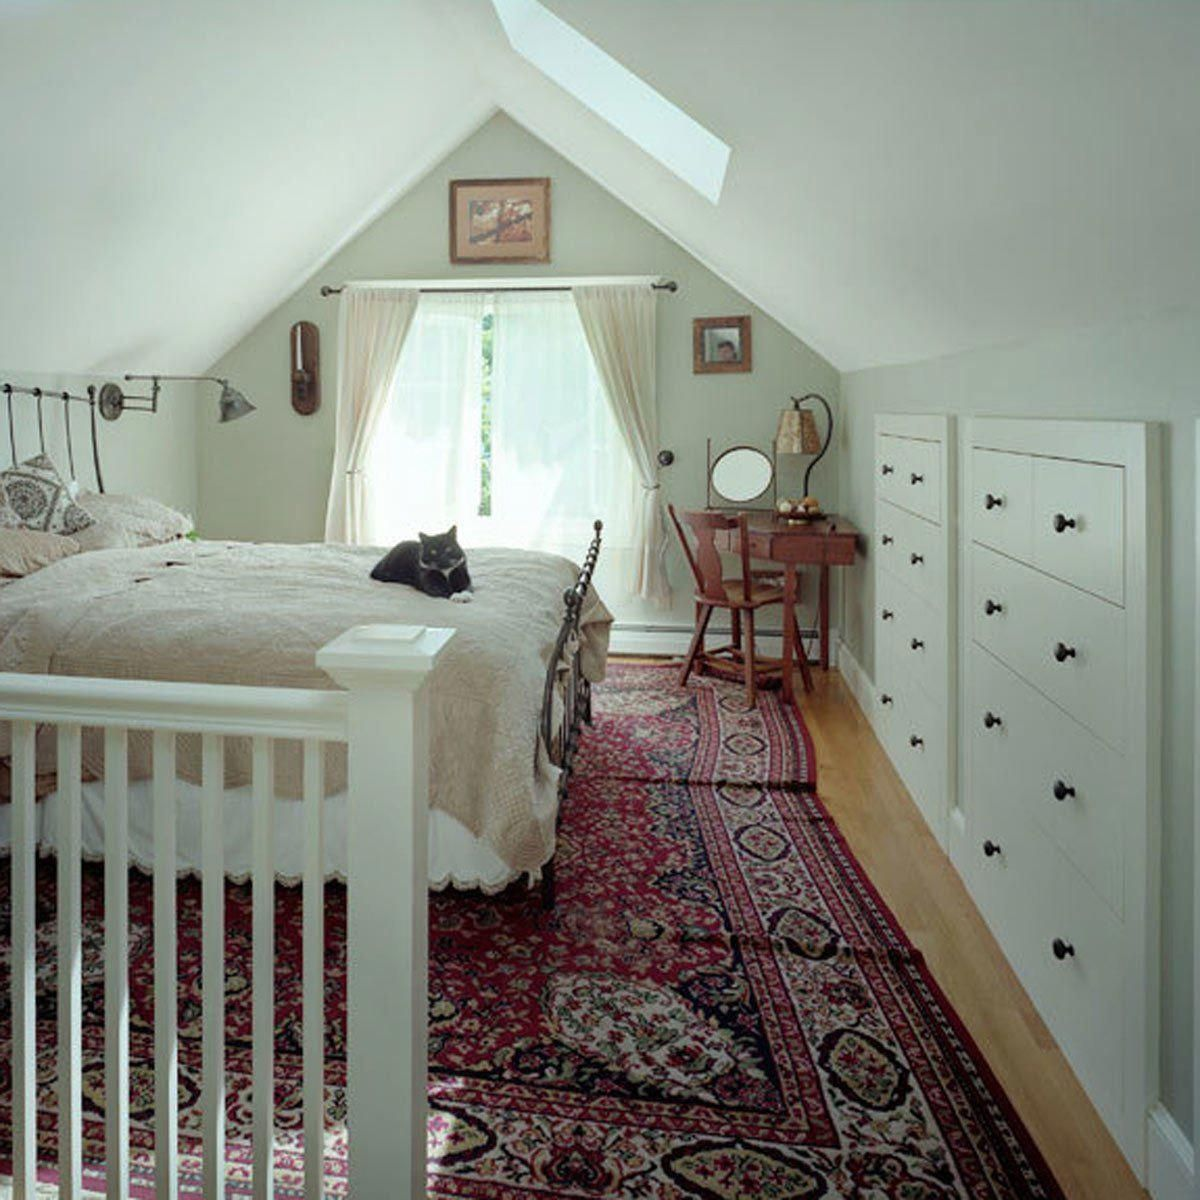 9 Insane Ideas Can Change Your Life Slanted Attic Closet Finished Attic Master Suite Attic Living Sloped Attic Bedroom Small Attic Master Bedroom Attic Spaces